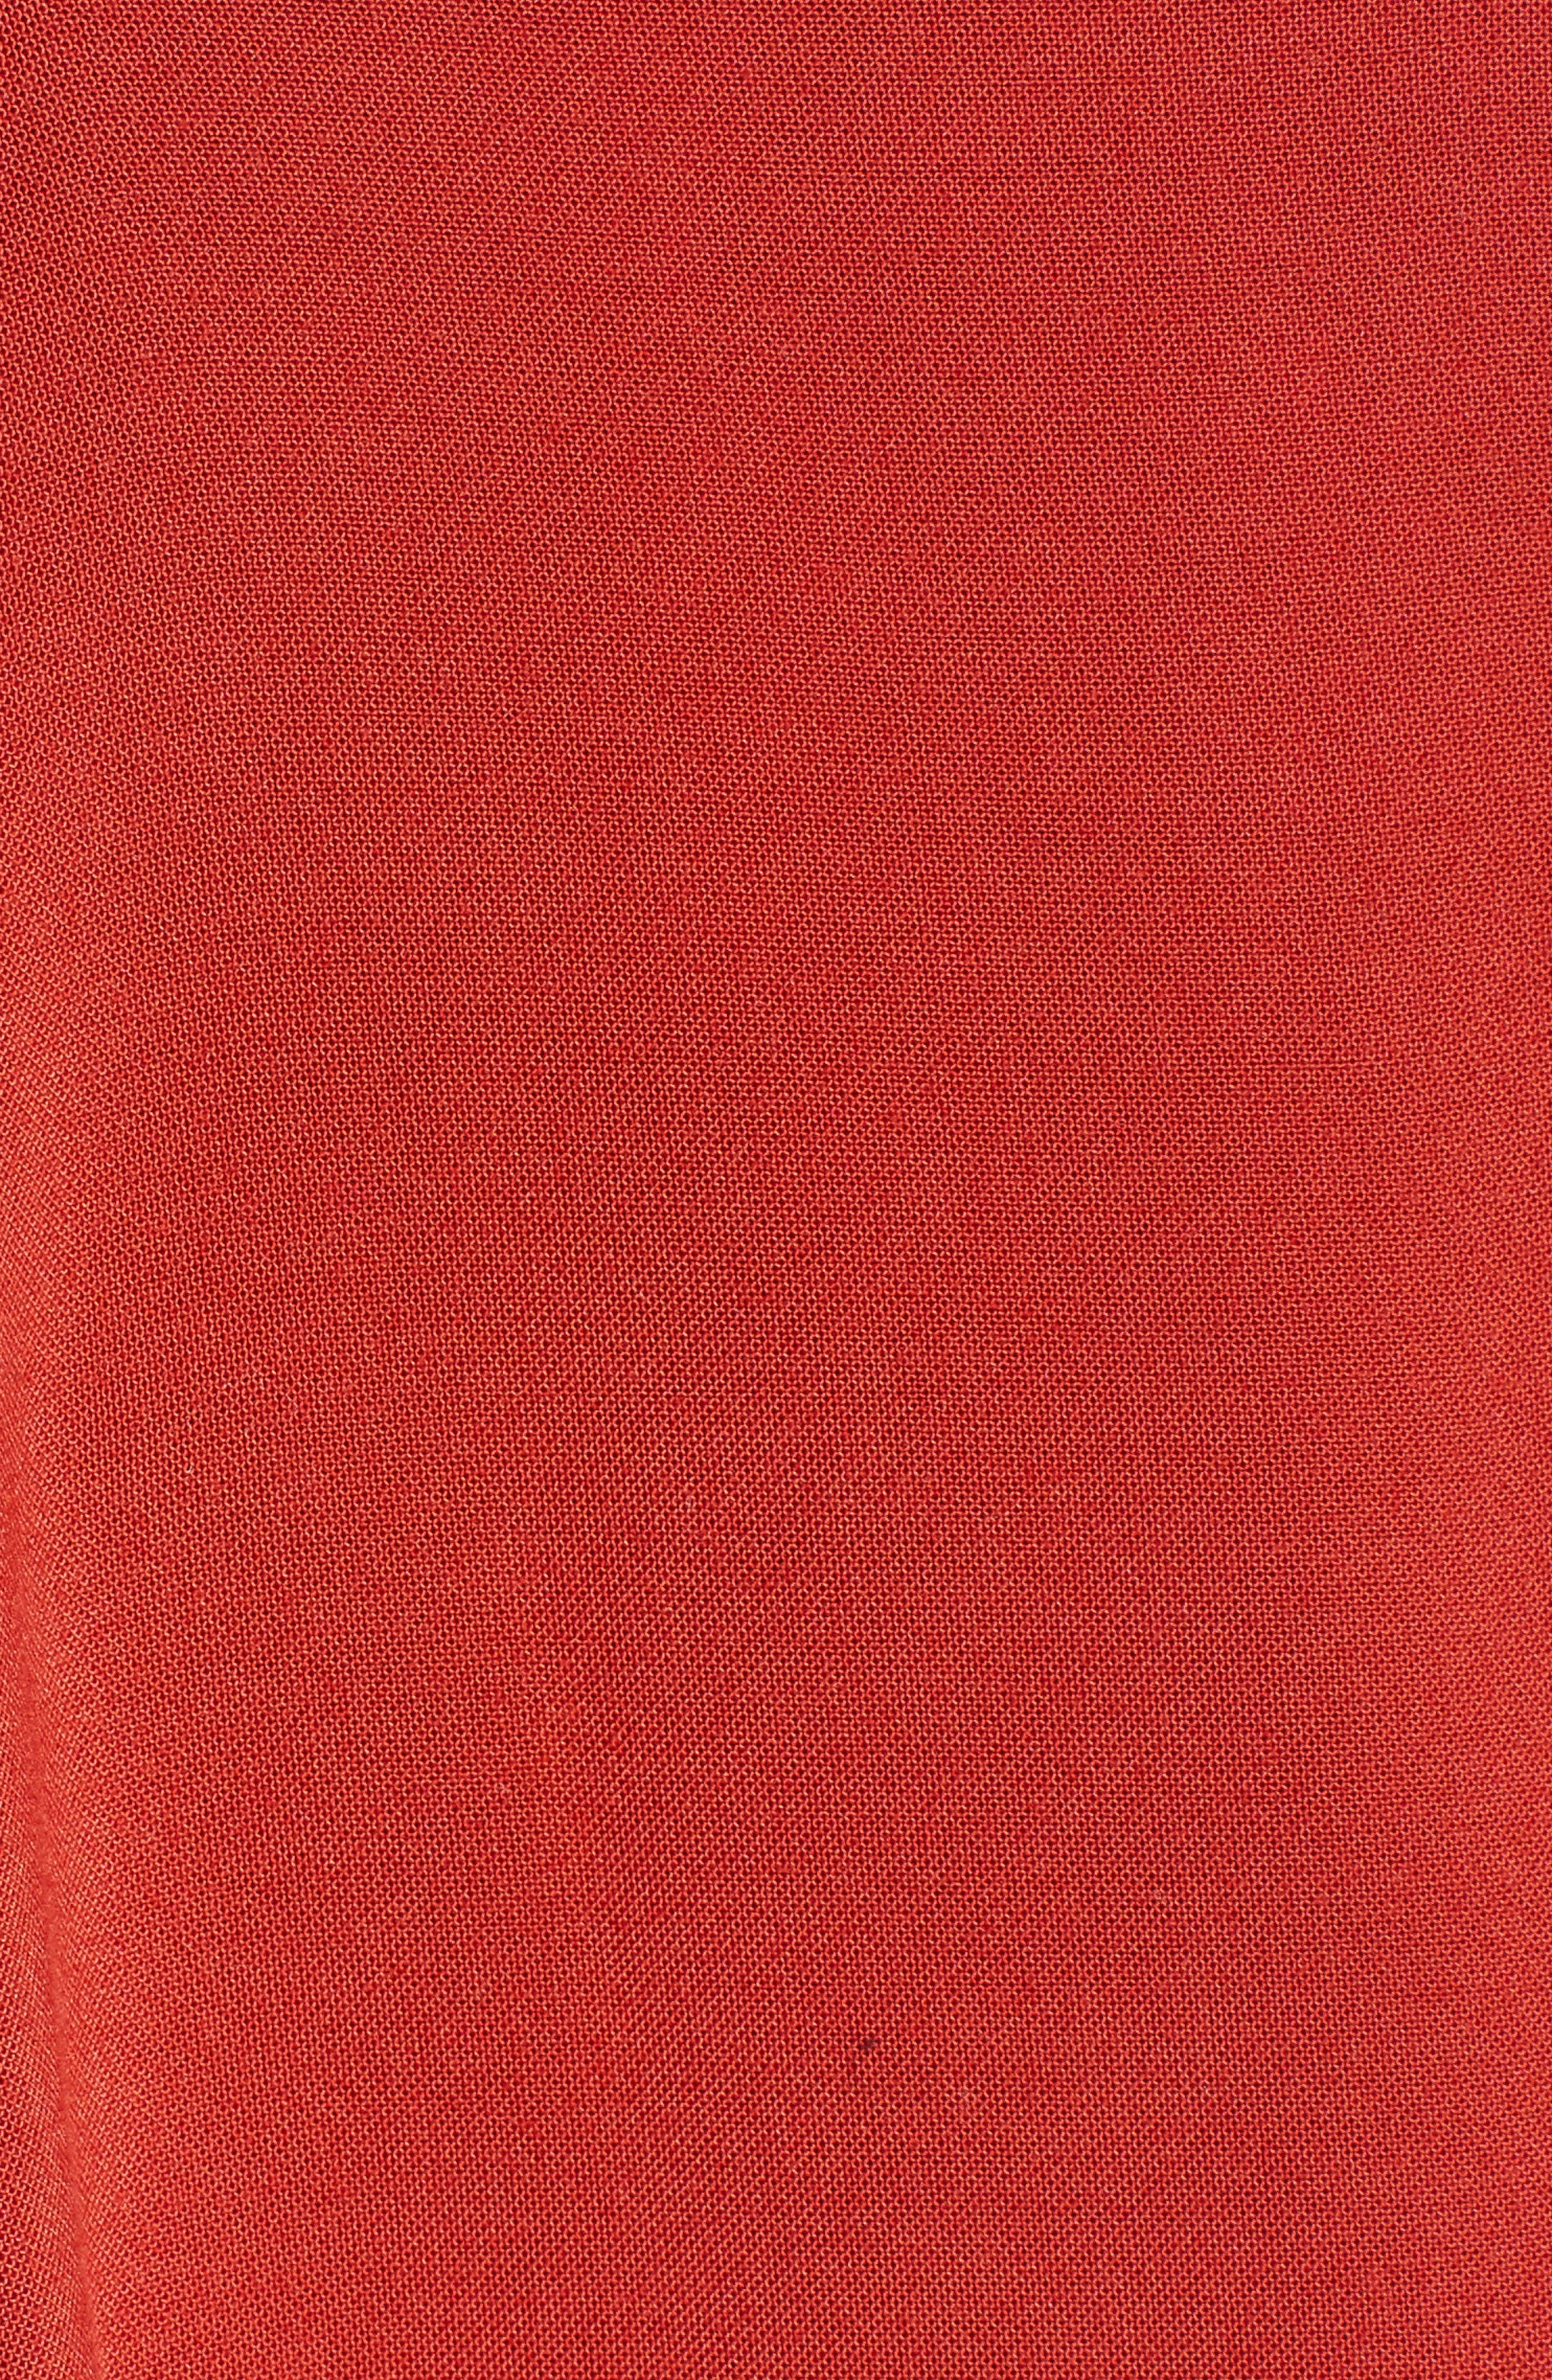 Button Front Skirt,                             Alternate thumbnail 5, color,                             649